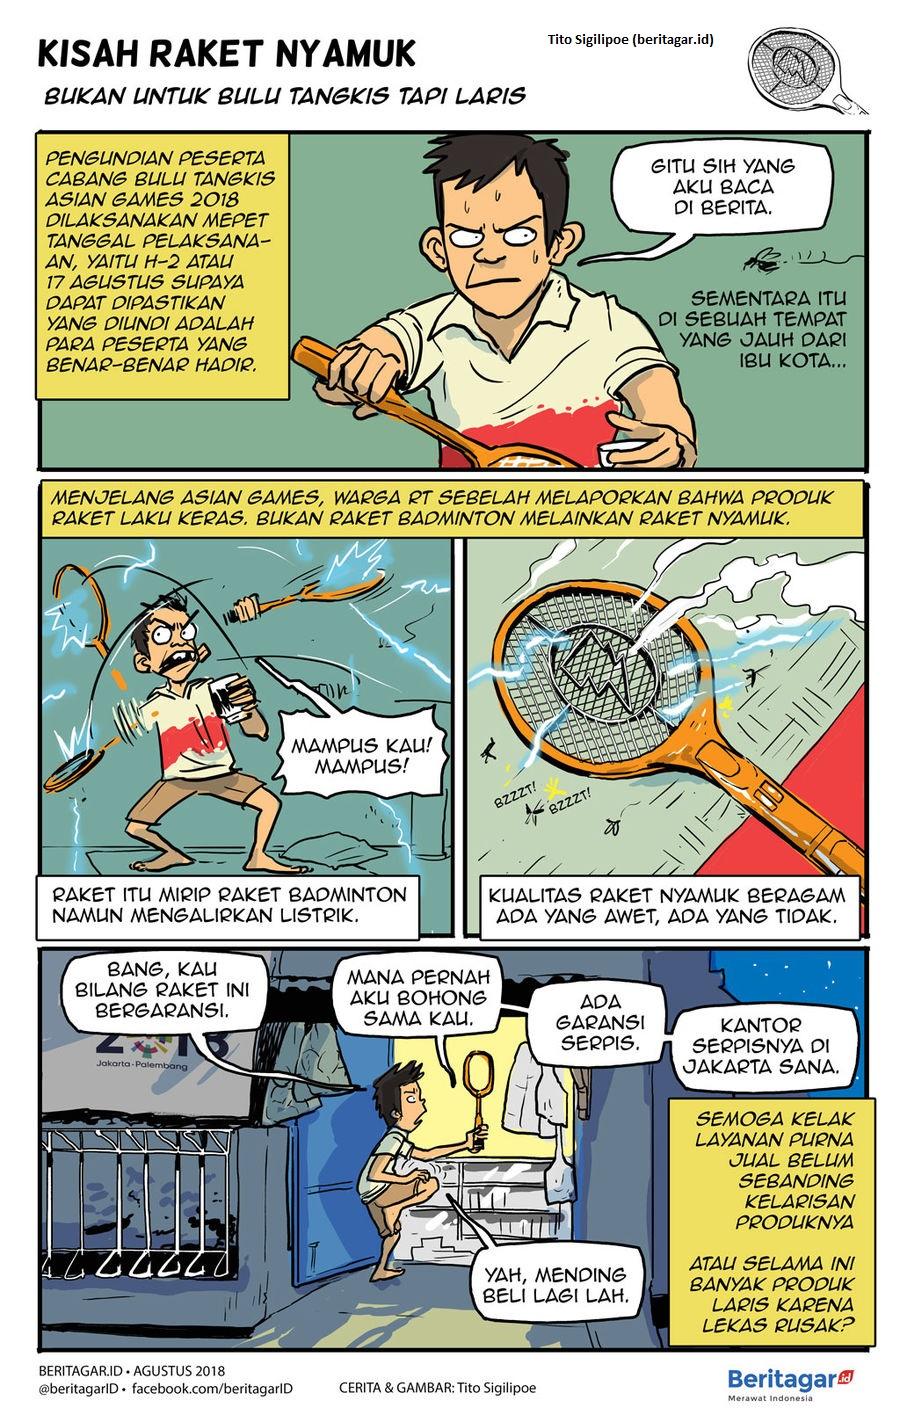 Raket Nyamuk Elektrik, Pembunuh Berdarah Dingin & Musuh Bebuyutan Bagi Nyamuk 4